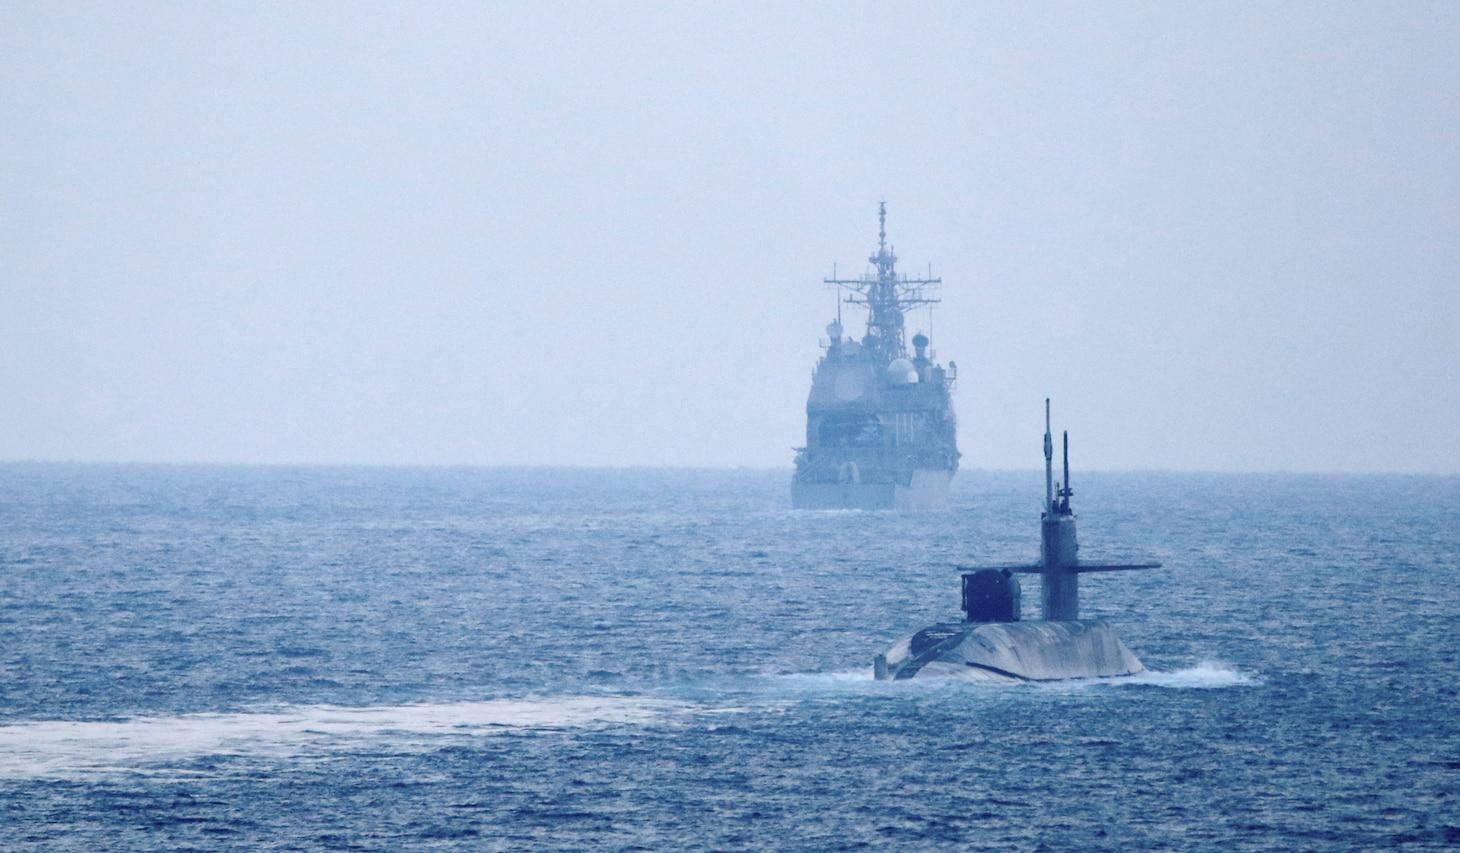 USS Port Royal (CG 73), USS Philippine Sea (CG 58) and USS Georgia (SSGN 729) transit the Strait of Hormuz.